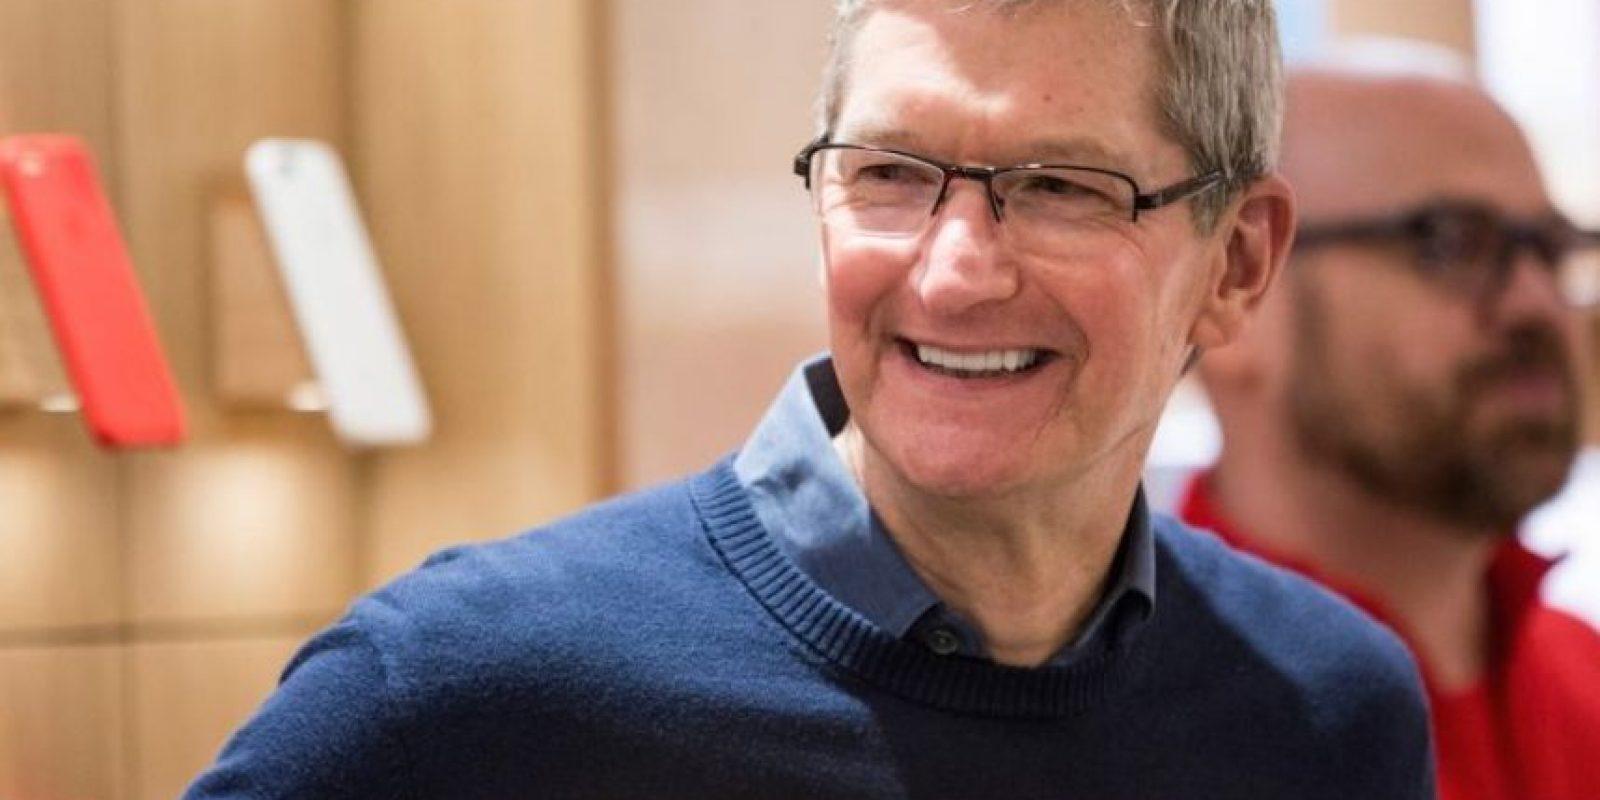 Según se reveló, Tim quizó donarle parte de su hígado a Steve Jobs para salvarle la vida. Foto:Getty Images